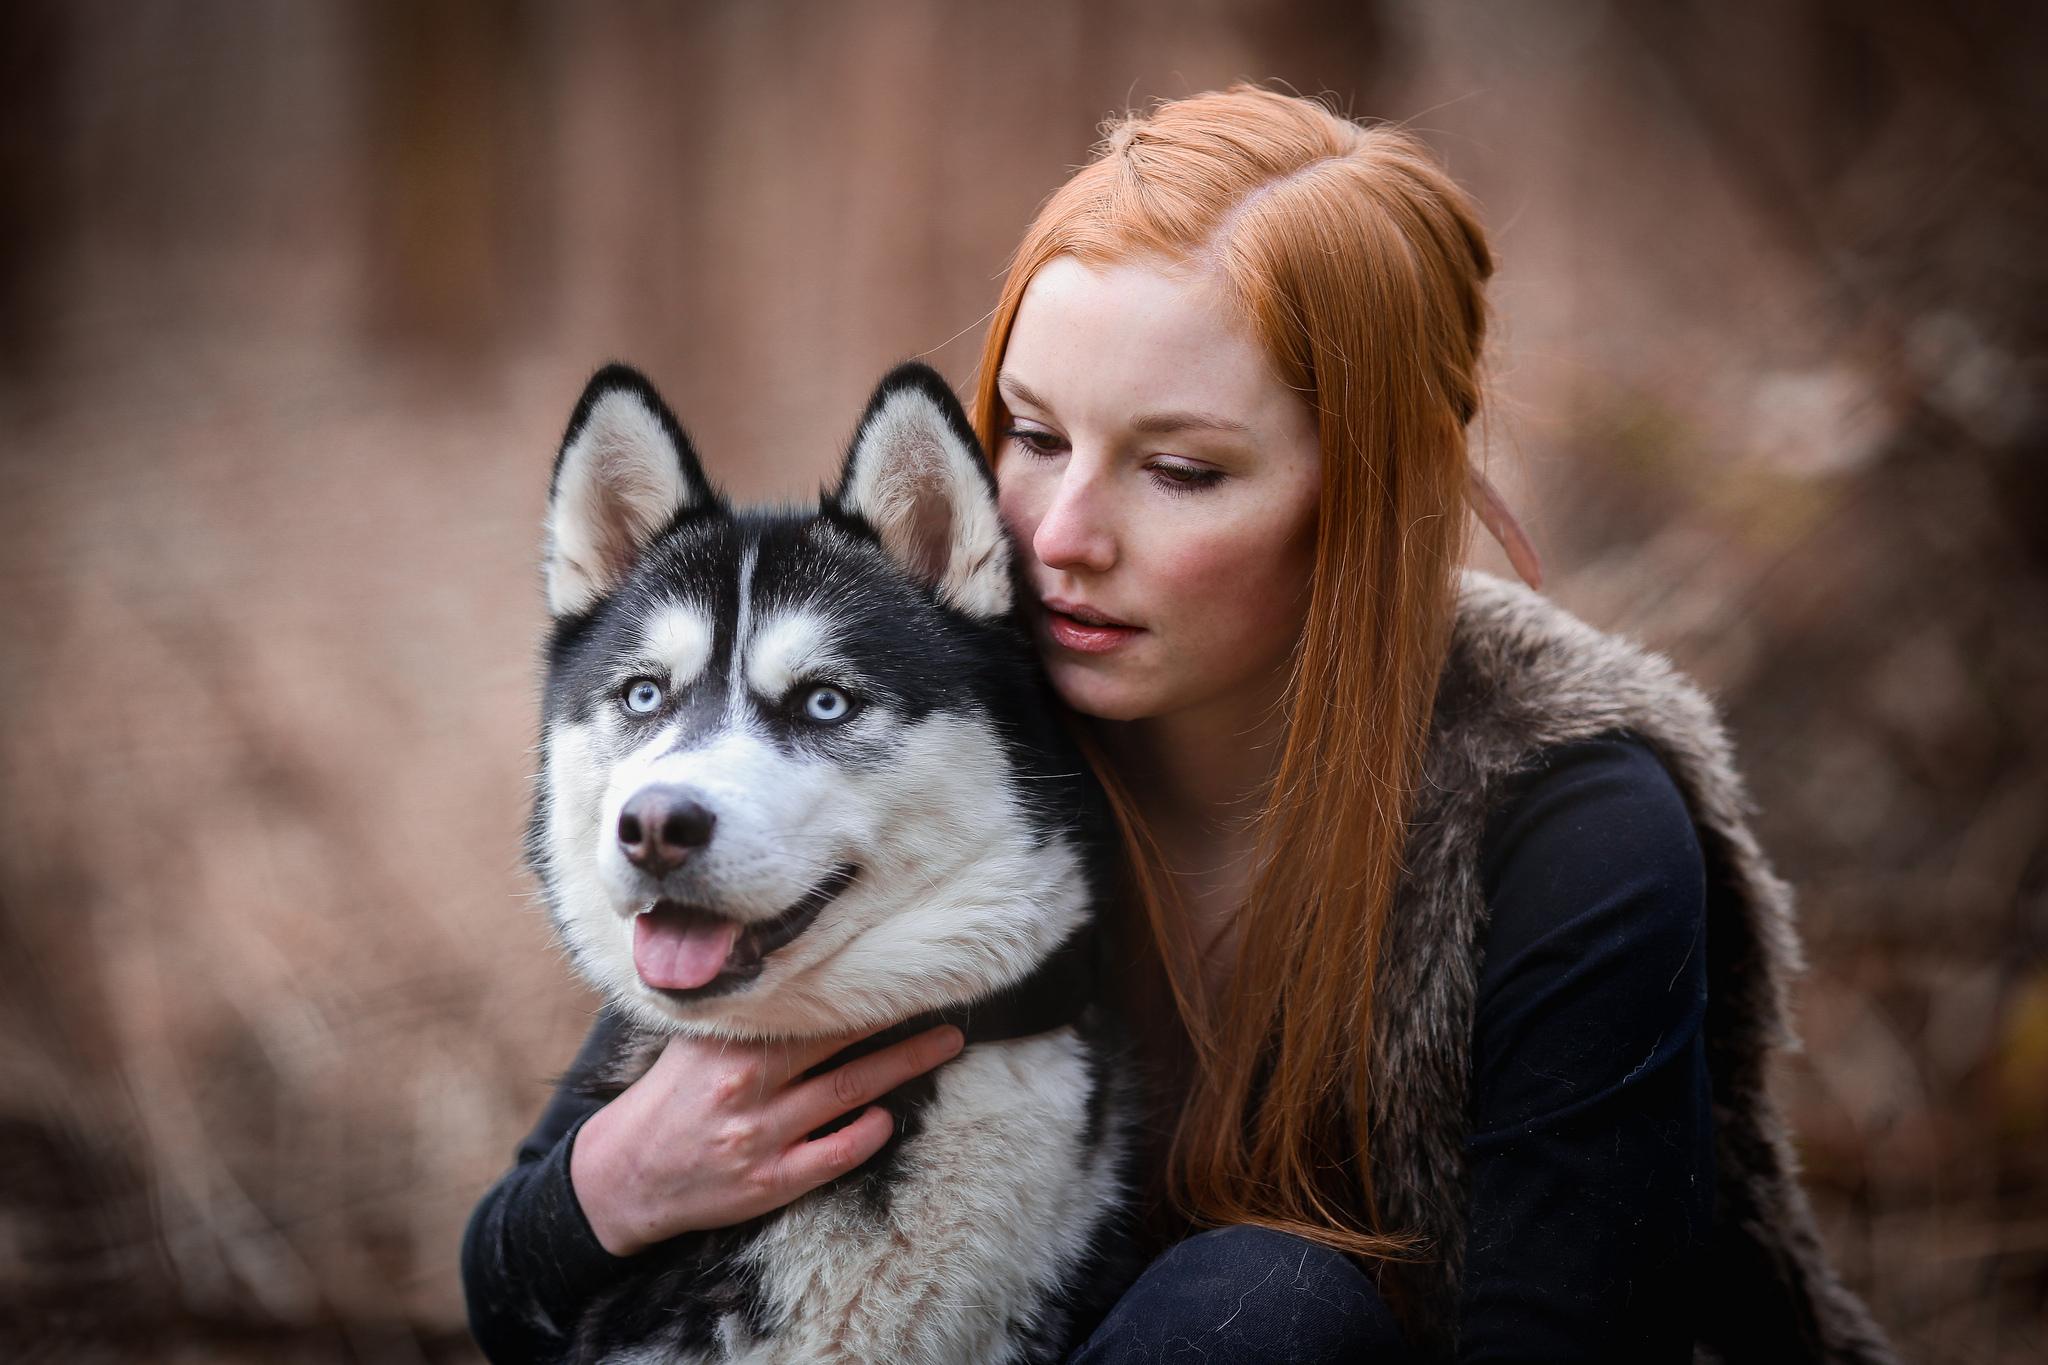 Красивые девушки с хаски фото